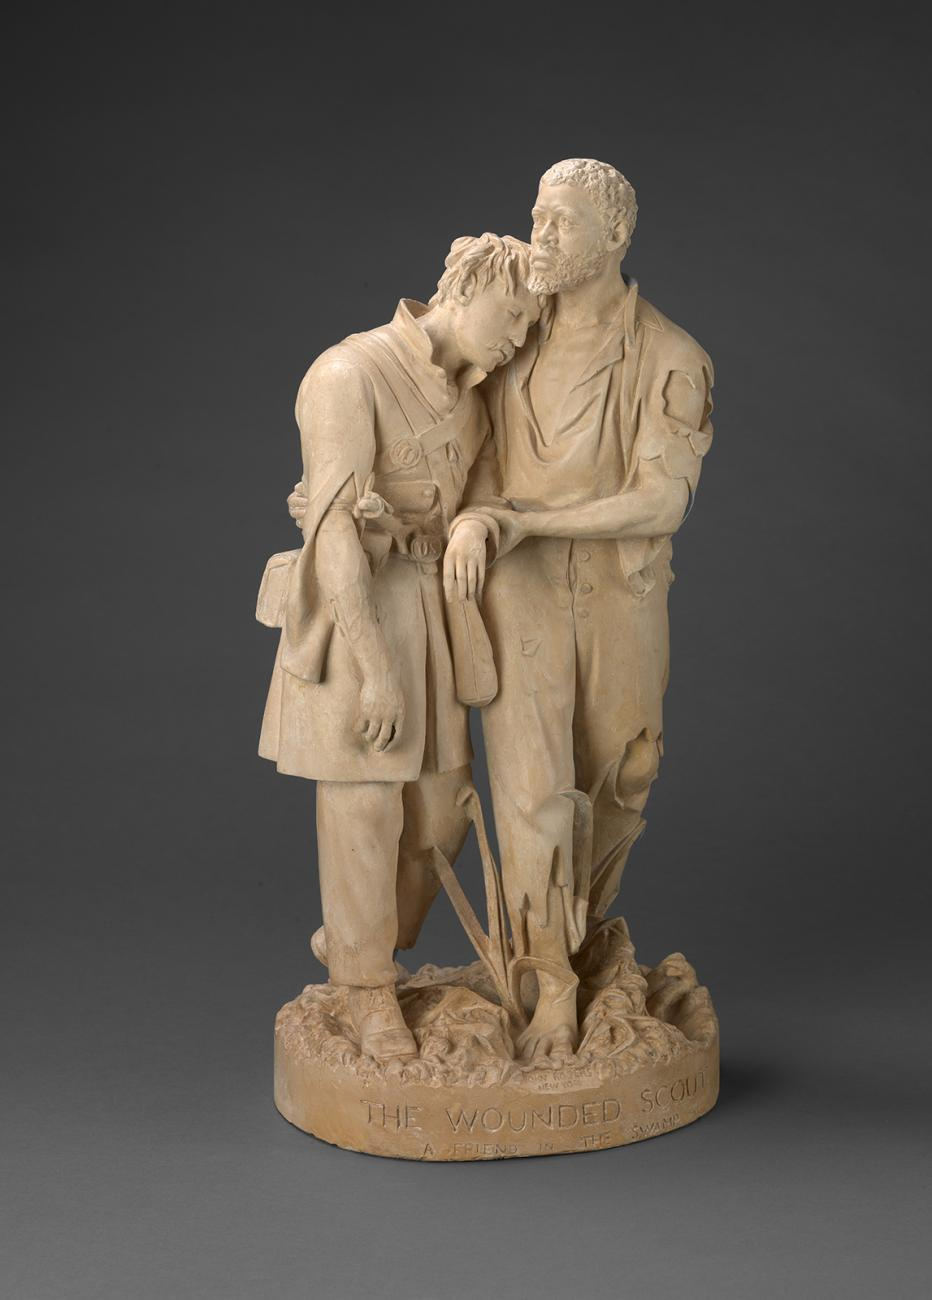 A sculpture of two men